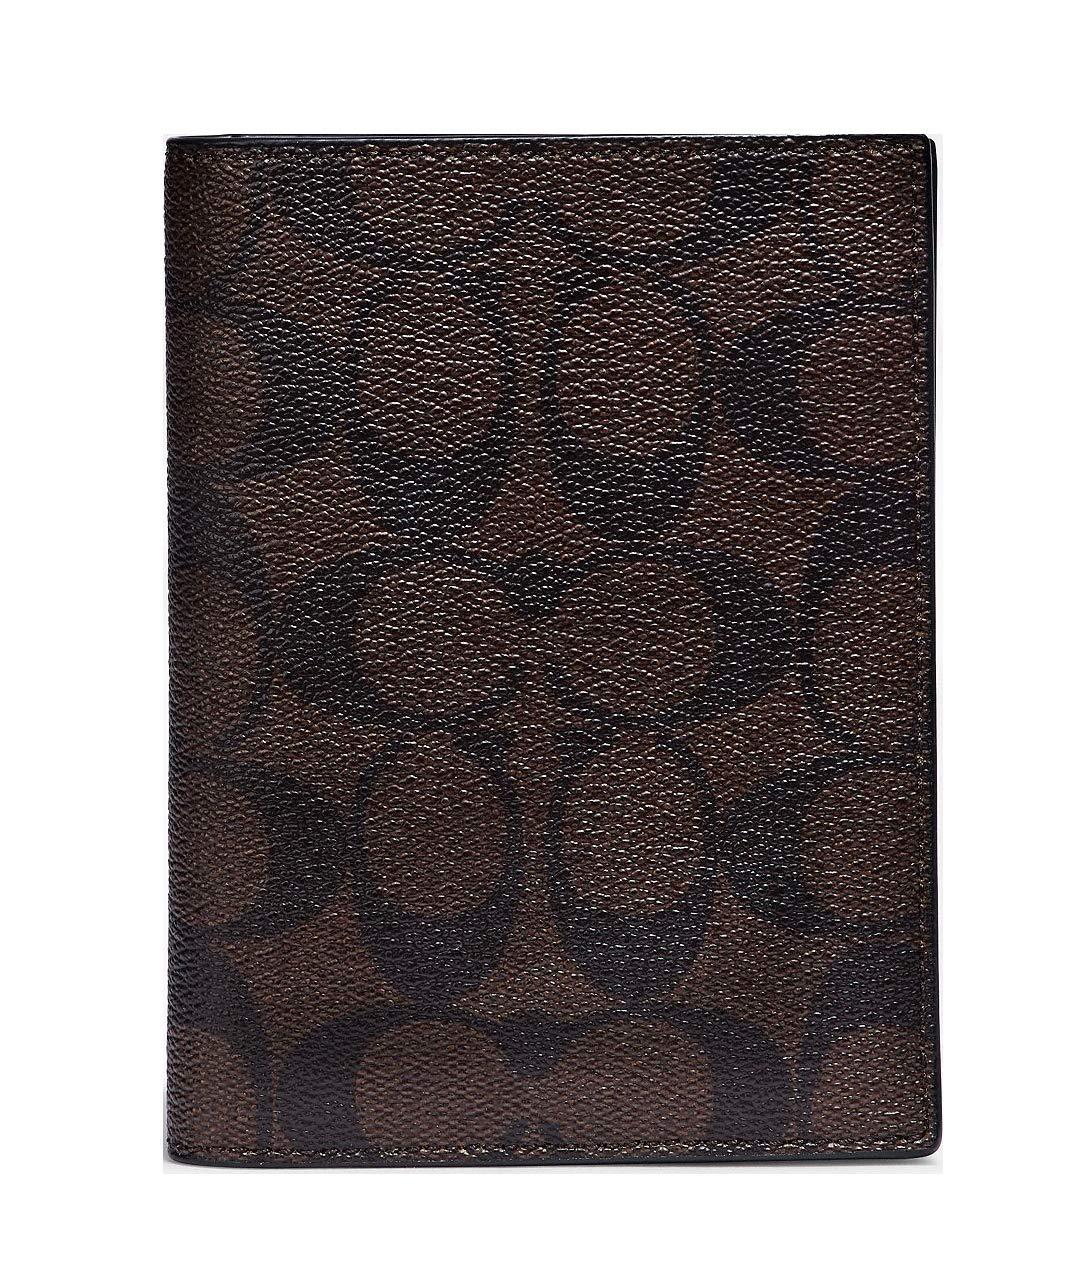 Coach Passport Case in Signature Canvas - Mahogany/Black $125